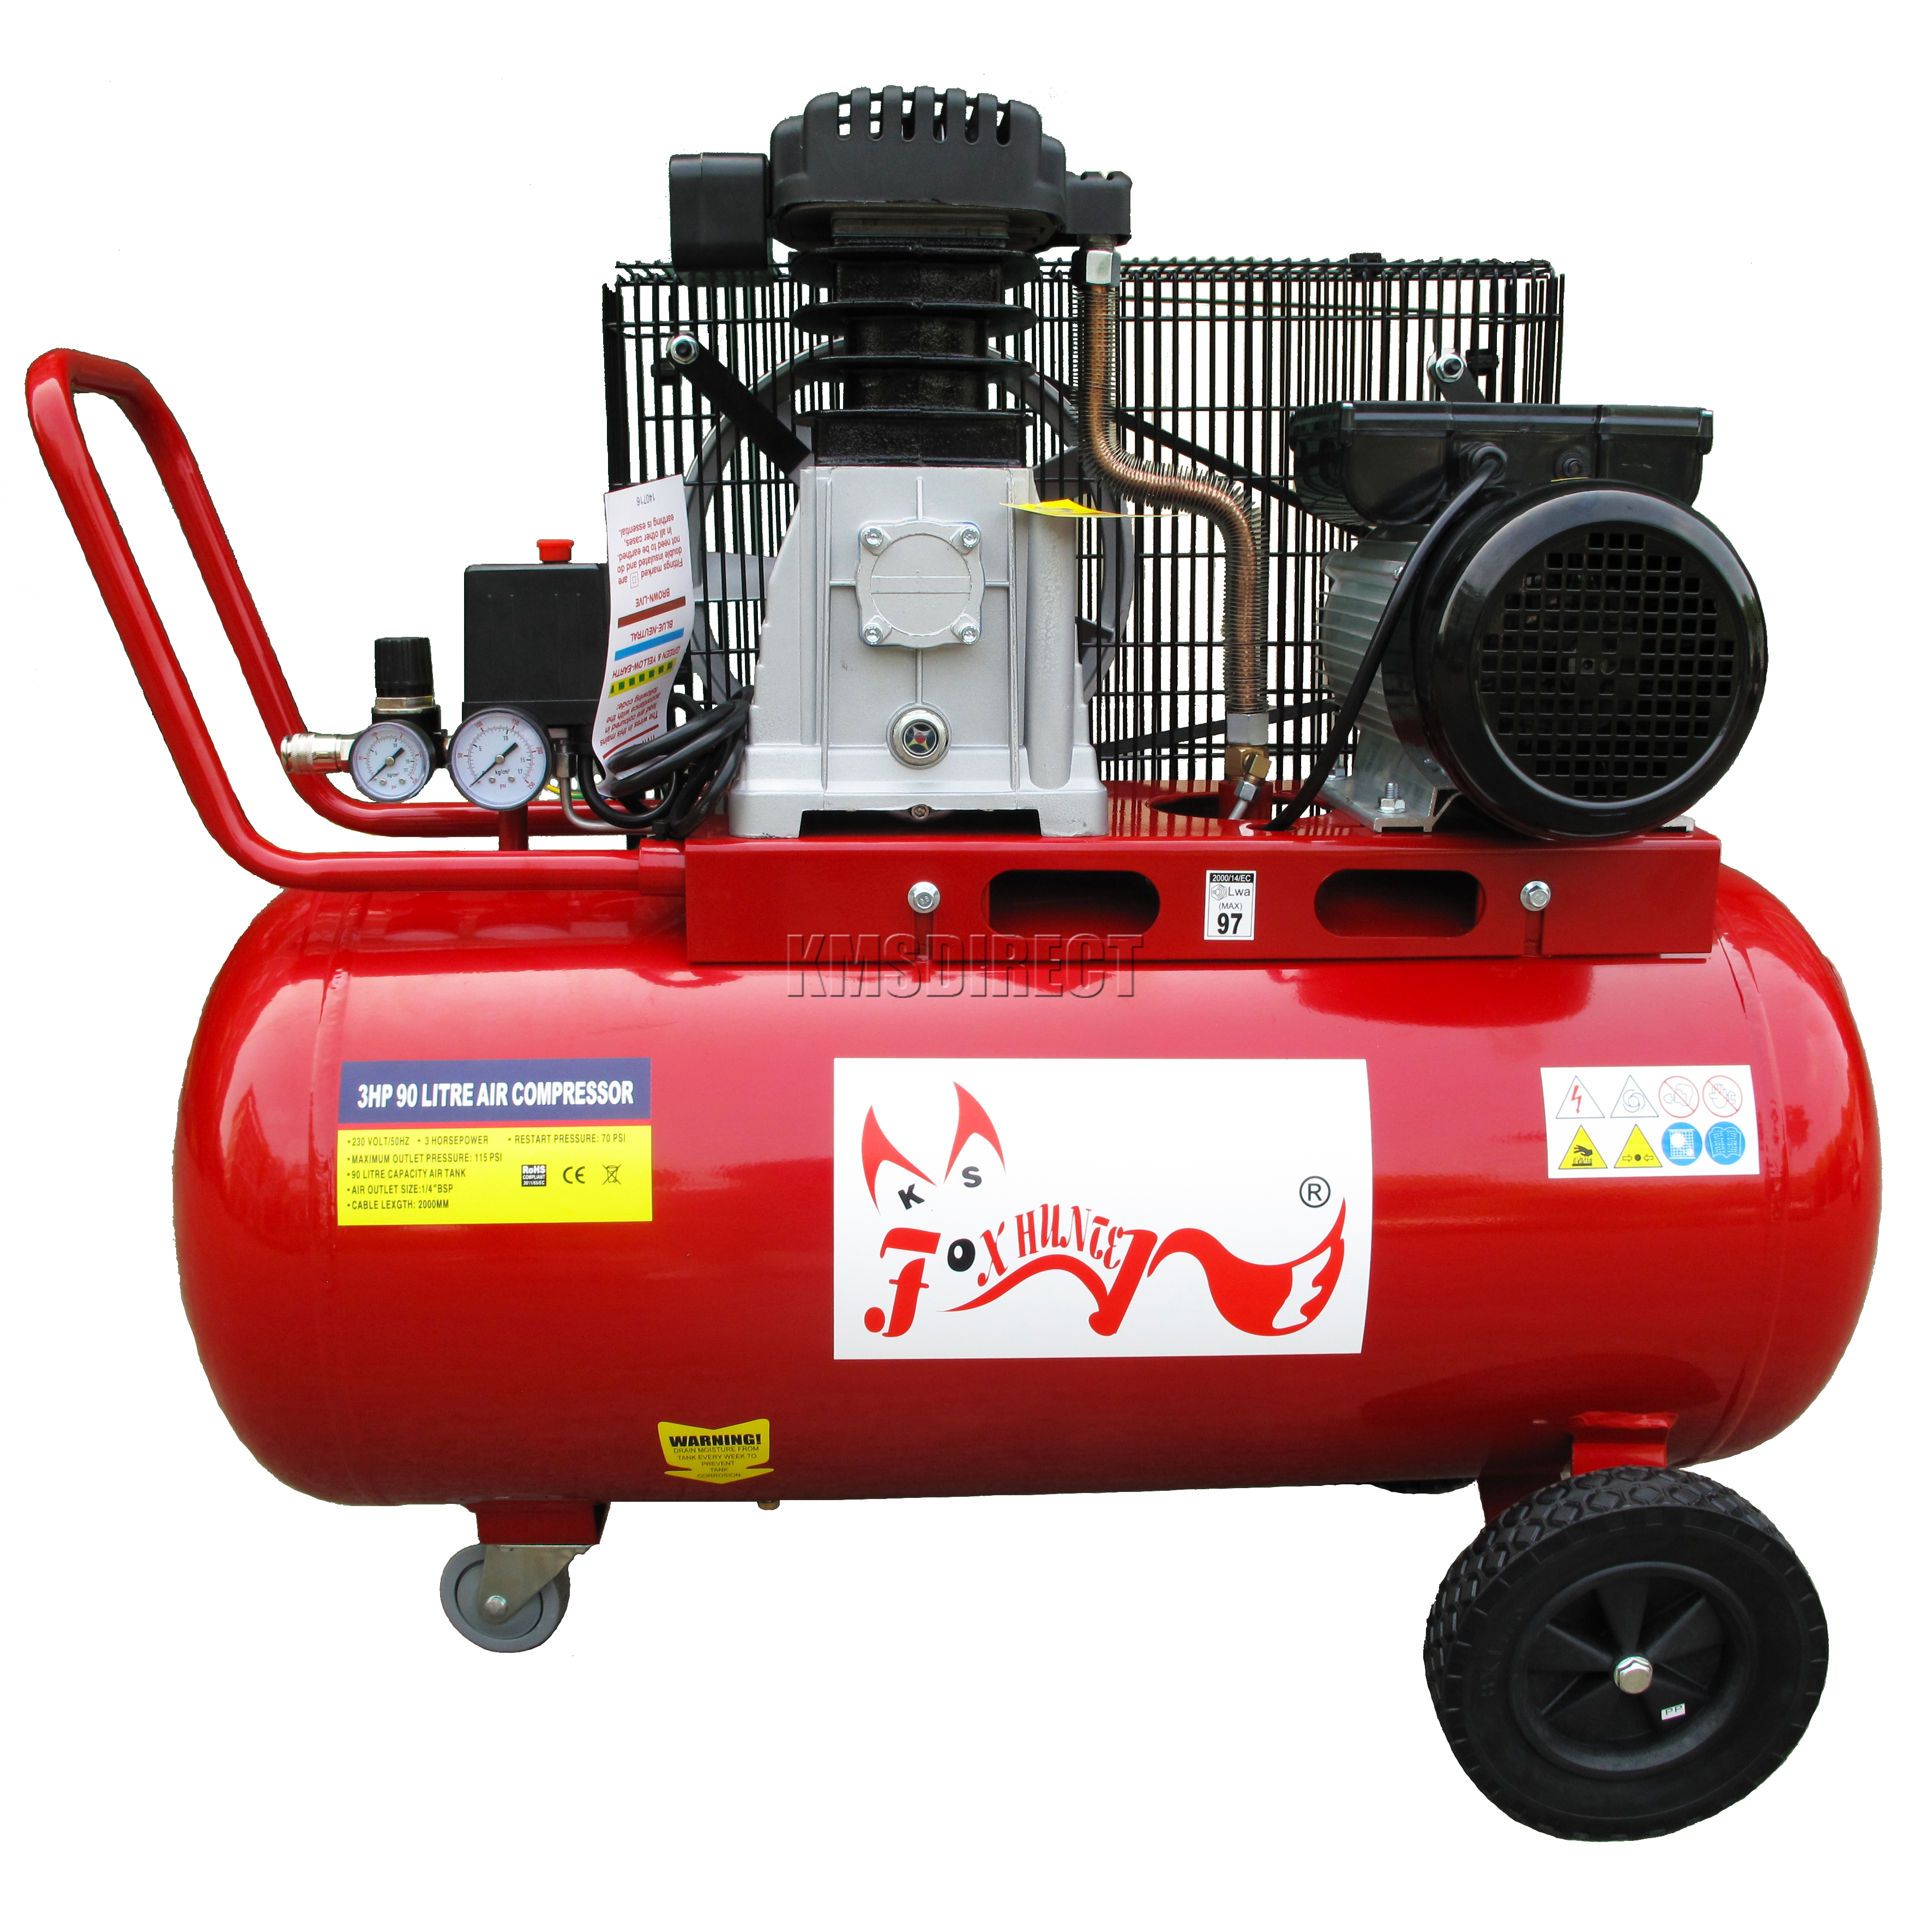 Foxhunter 90ltr 3hp Electric Air Compressor 20 Gallon 12